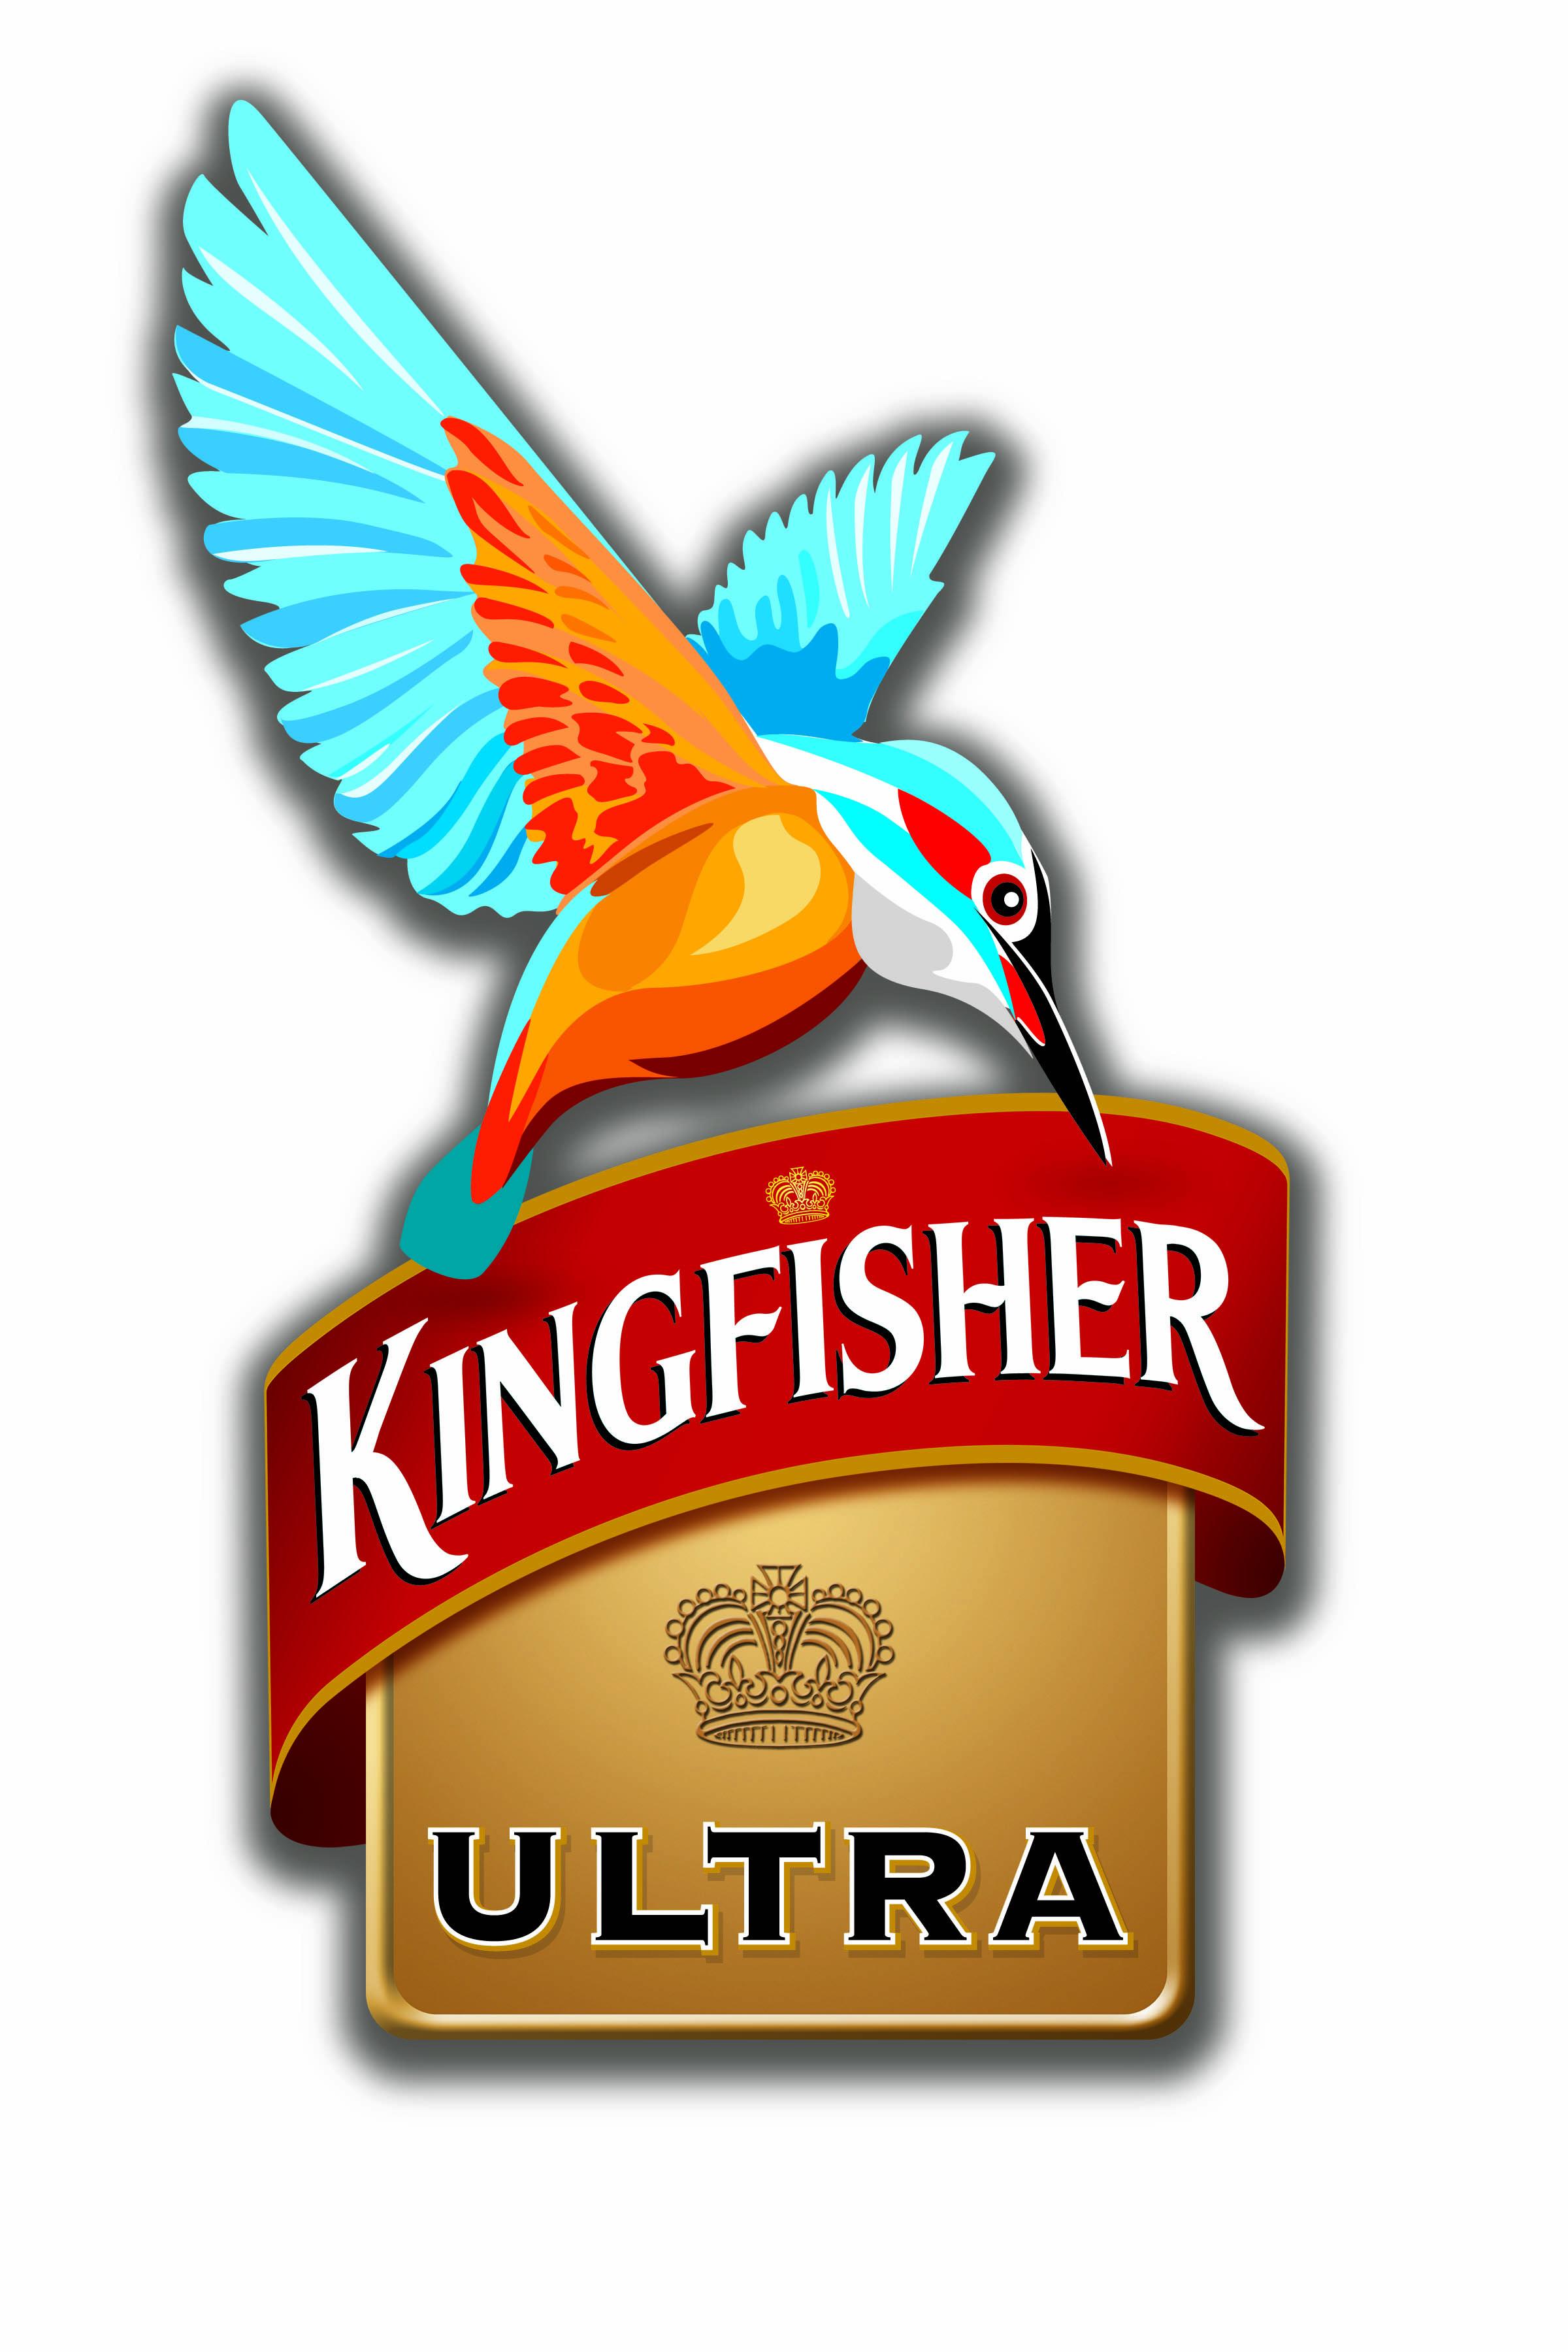 Kingfisher ultra Logos.